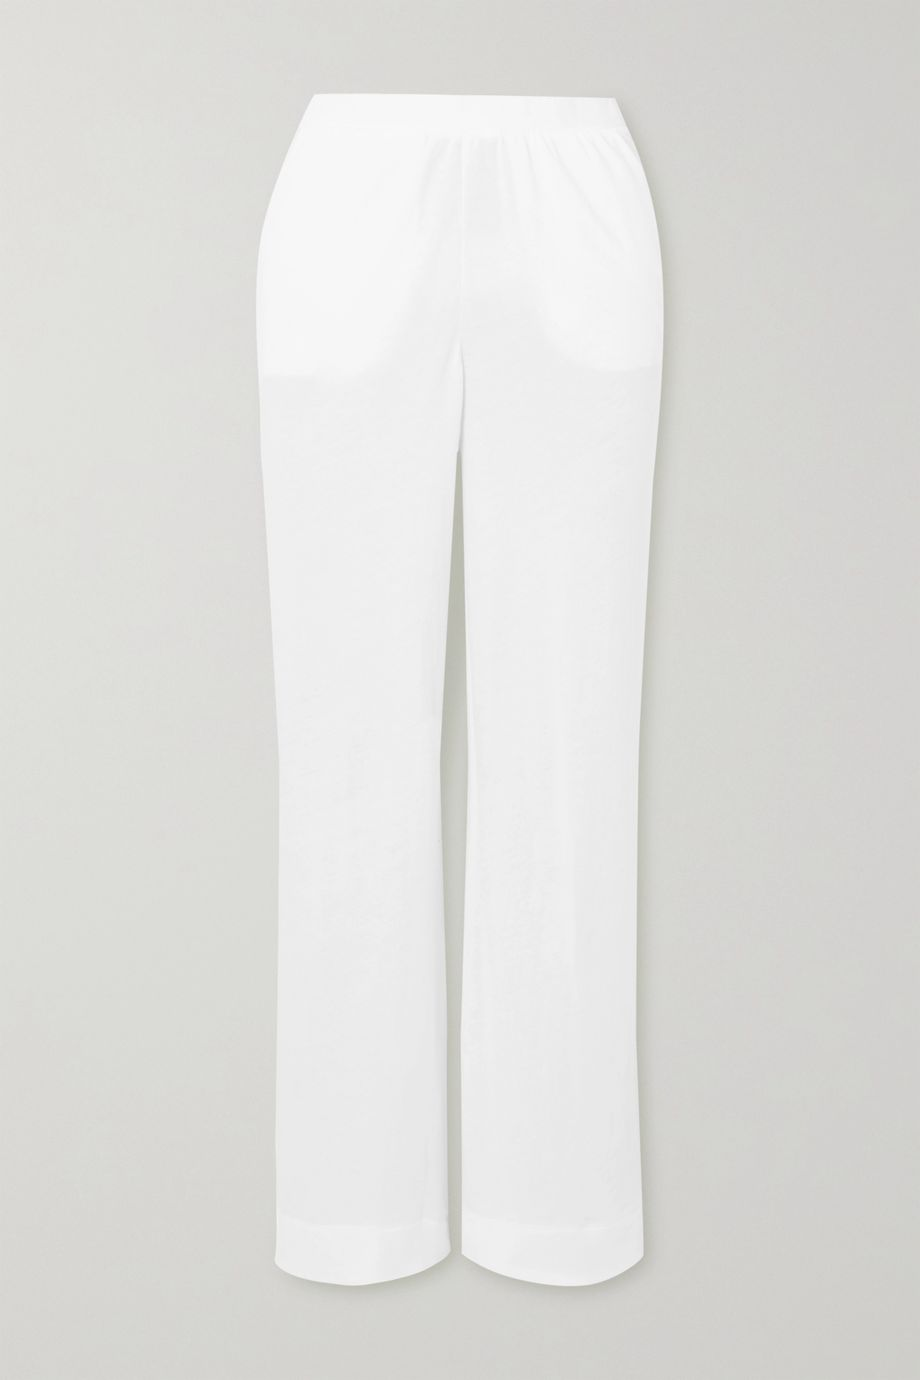 Skin Adrielle brushed-cotton pajama pants